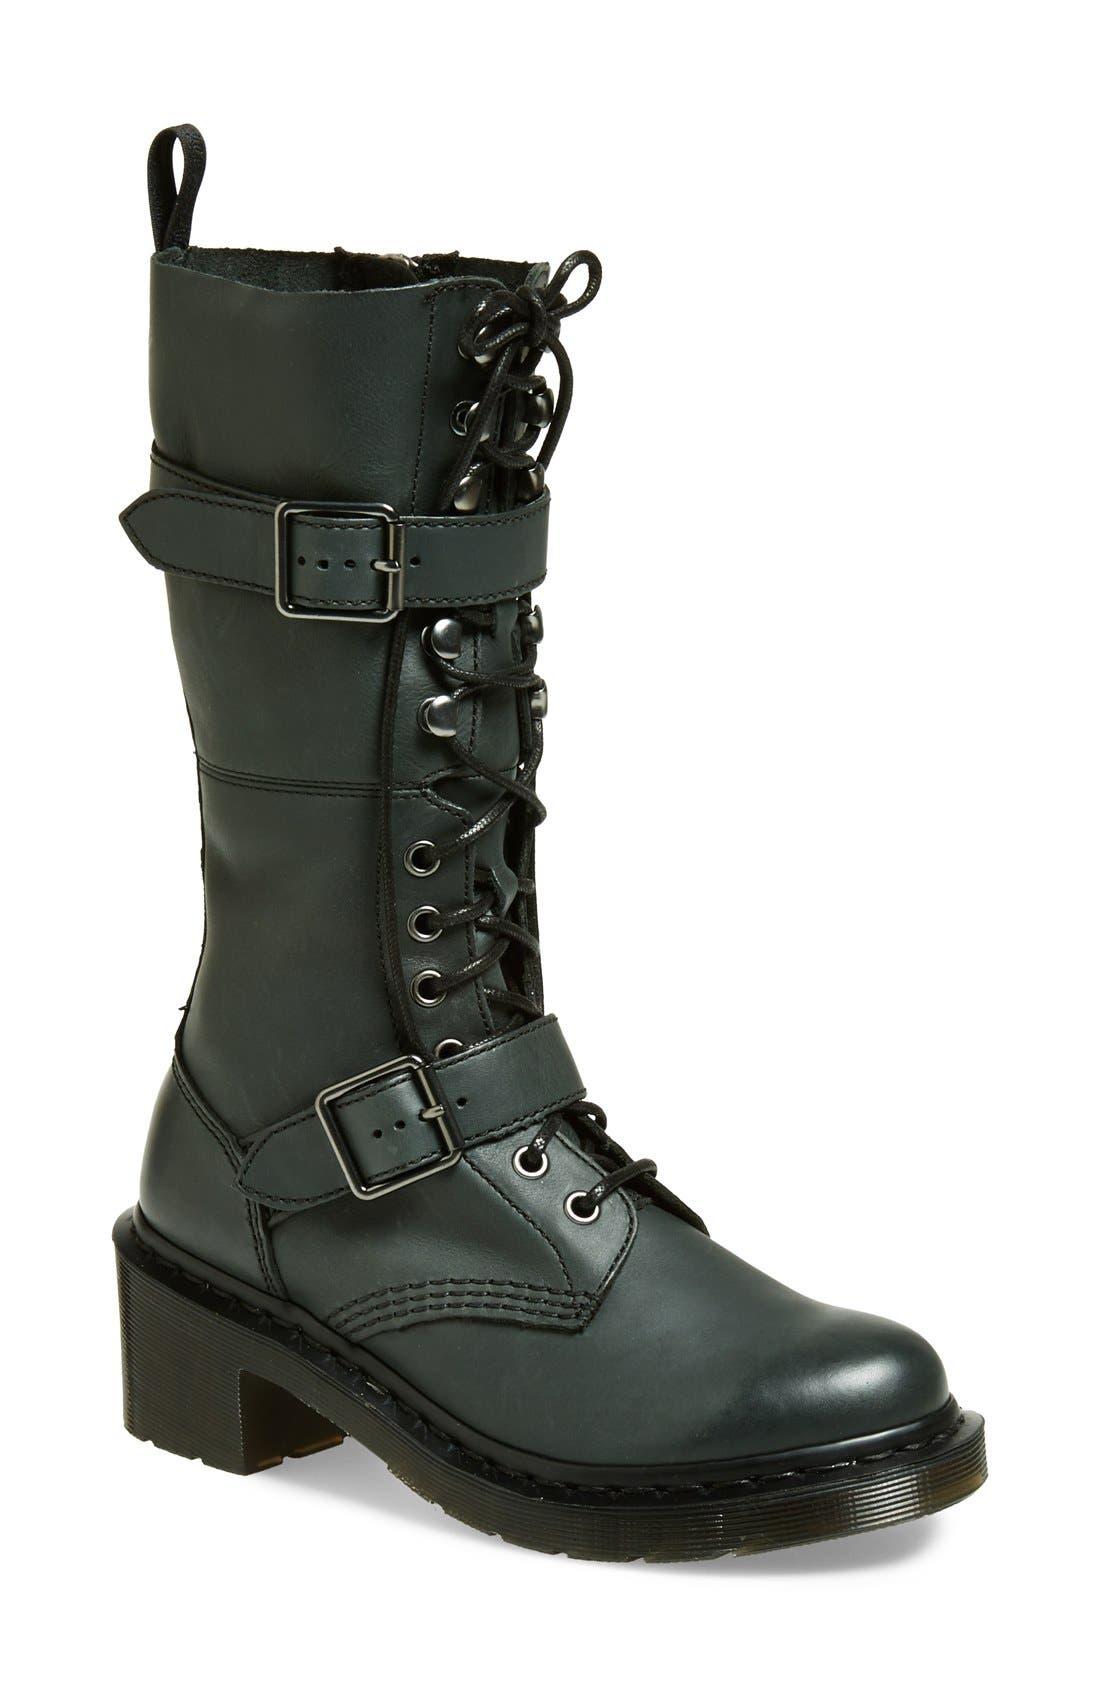 Main Image - Dr. Martens 'Josefa' Military Boot (Women)